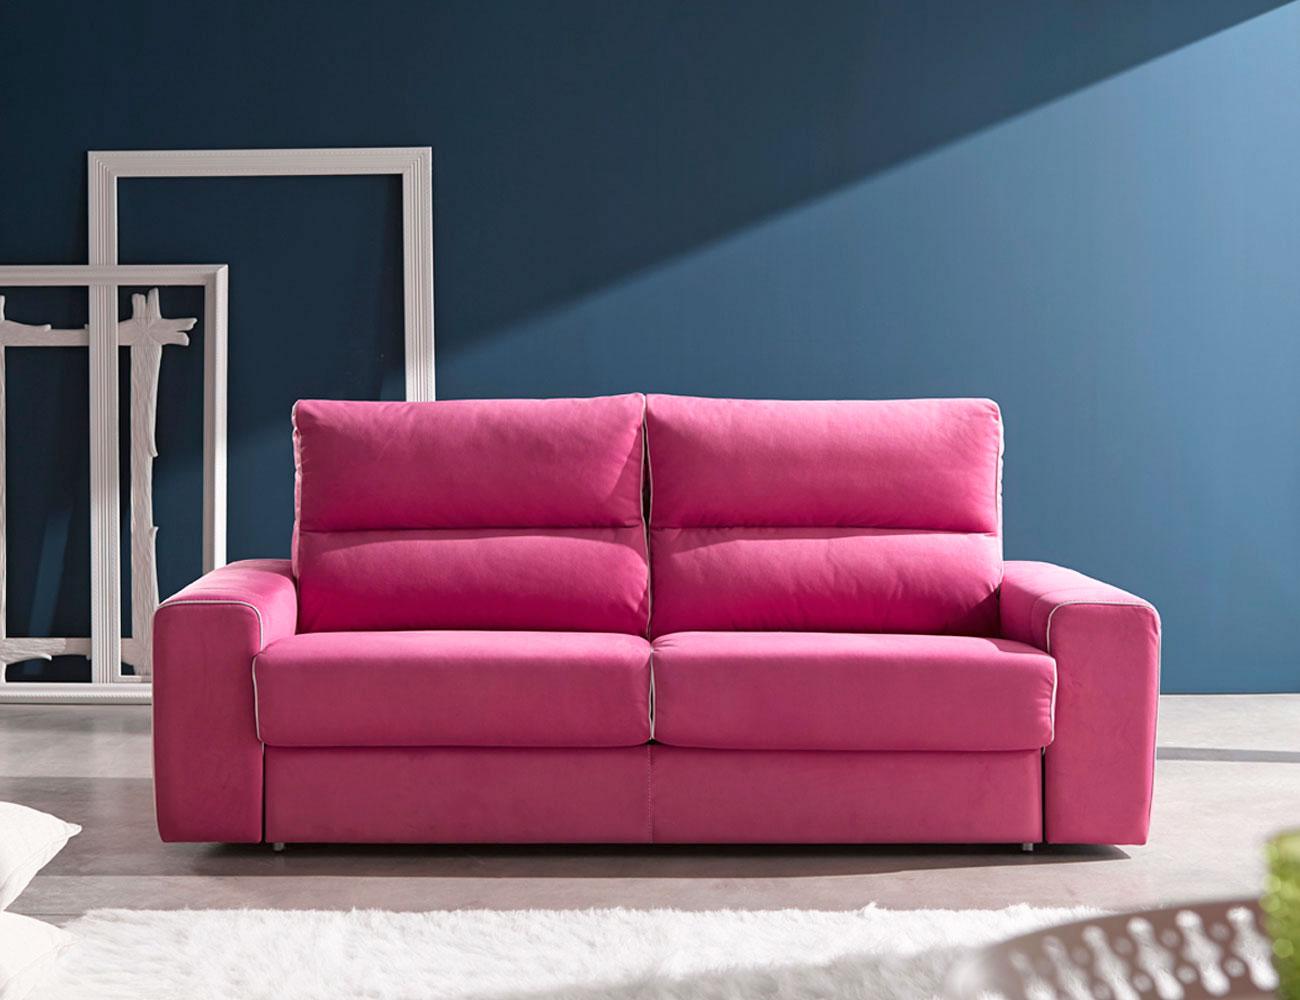 Sofa cama pedro ortiz apertura italiano